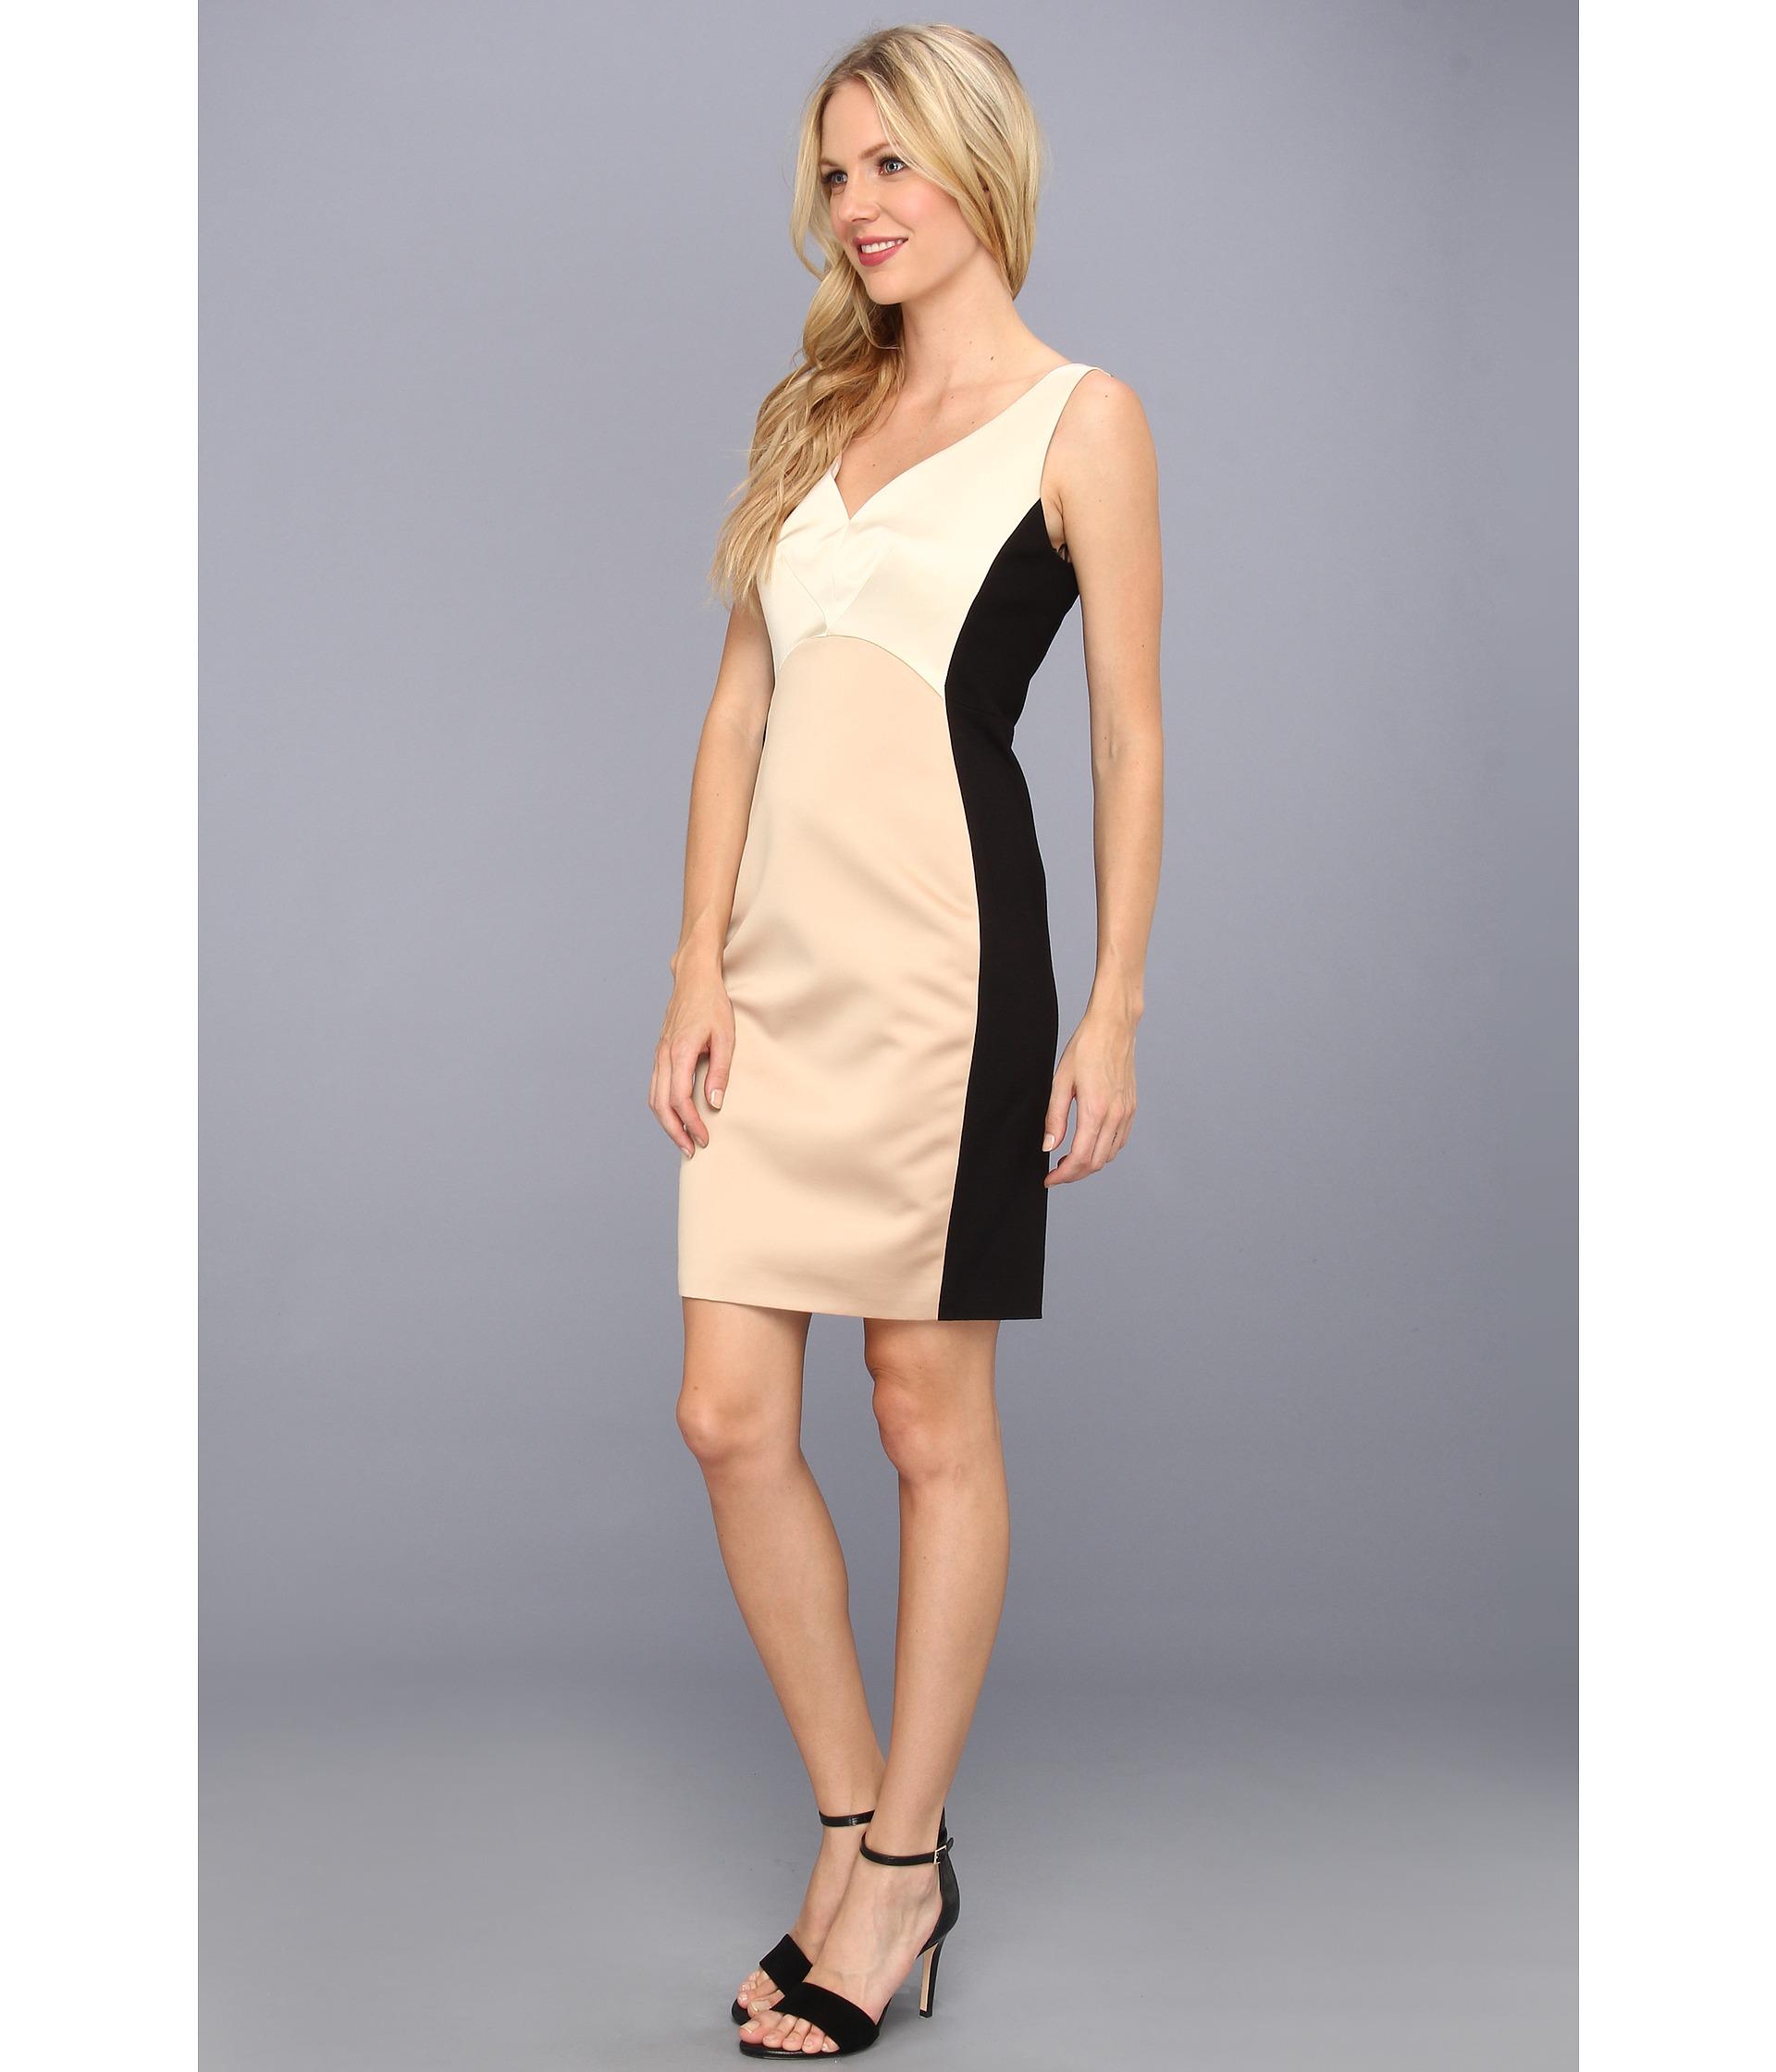 Badgley Mischka Color Block Sleeveless Dress Gold/Black